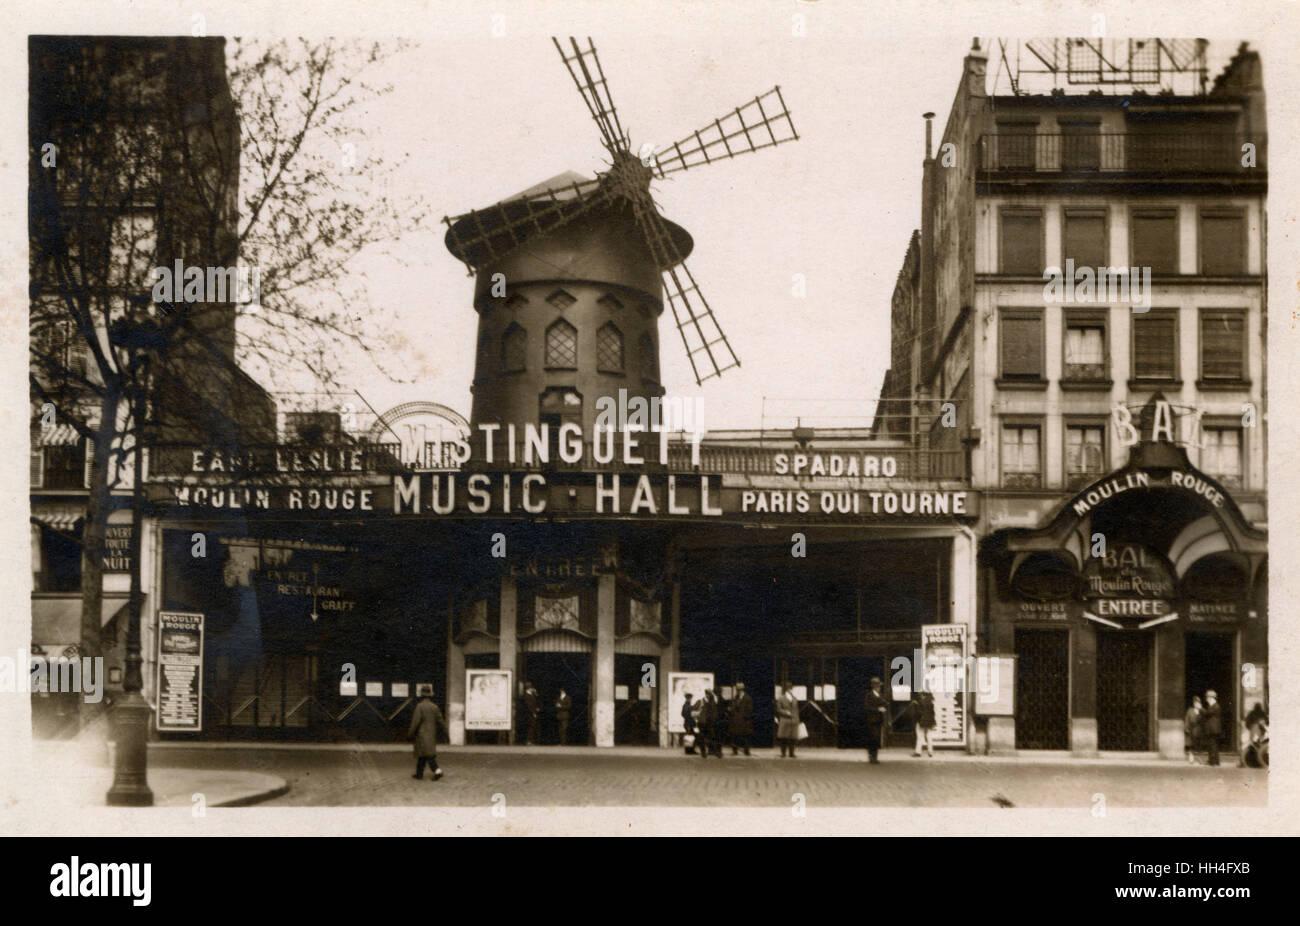 Moulin Rouge Music Hall, Paris - Performance by 'Mistinguett' advertised - Jeanne Florentine Bourgeois (1875 - Stock Image